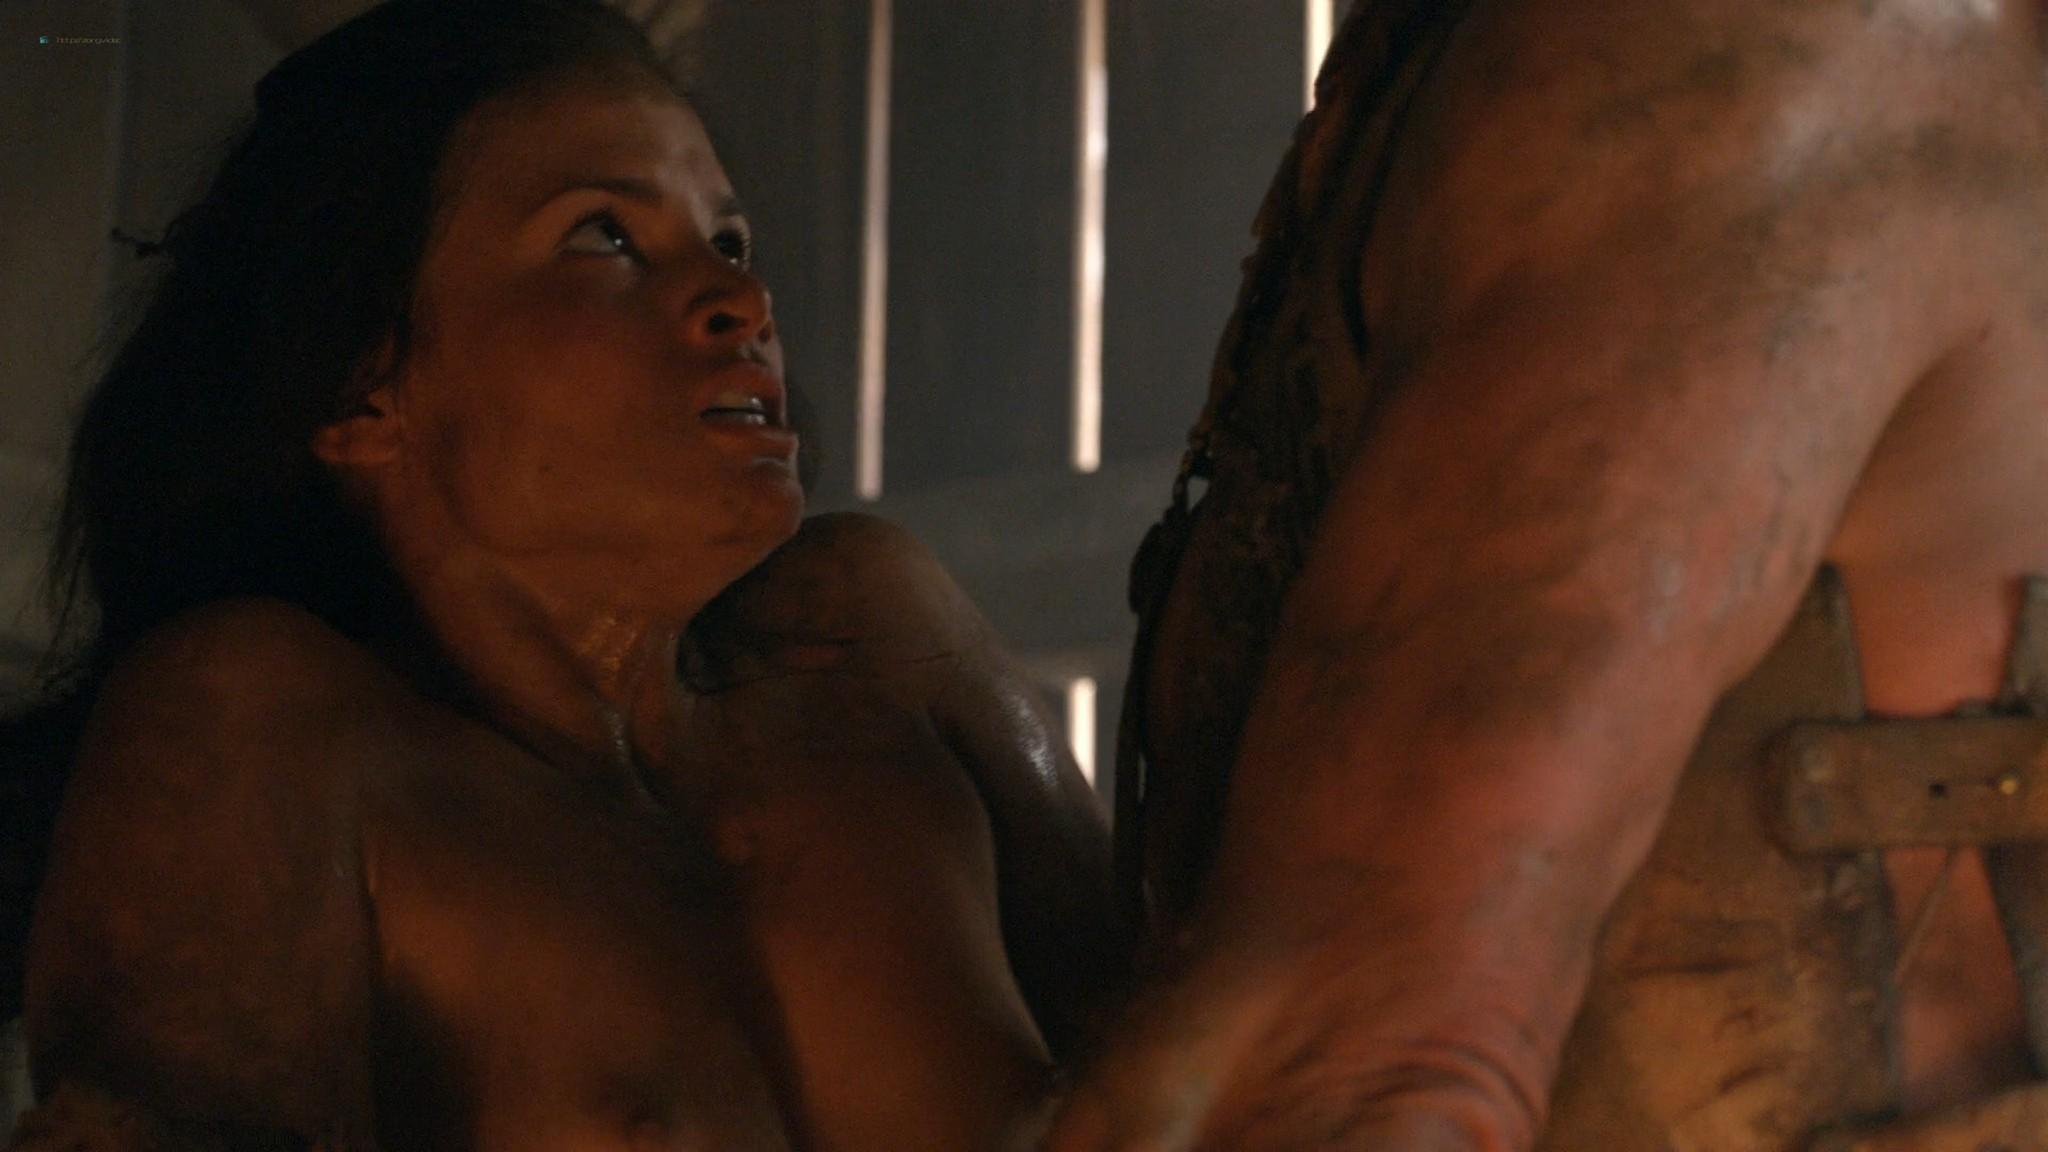 Viva Bianca nude topless Katrina Law, Bonnie Sveen, etc -Spartacus - Vengeance (2012) e3 1080p (4)